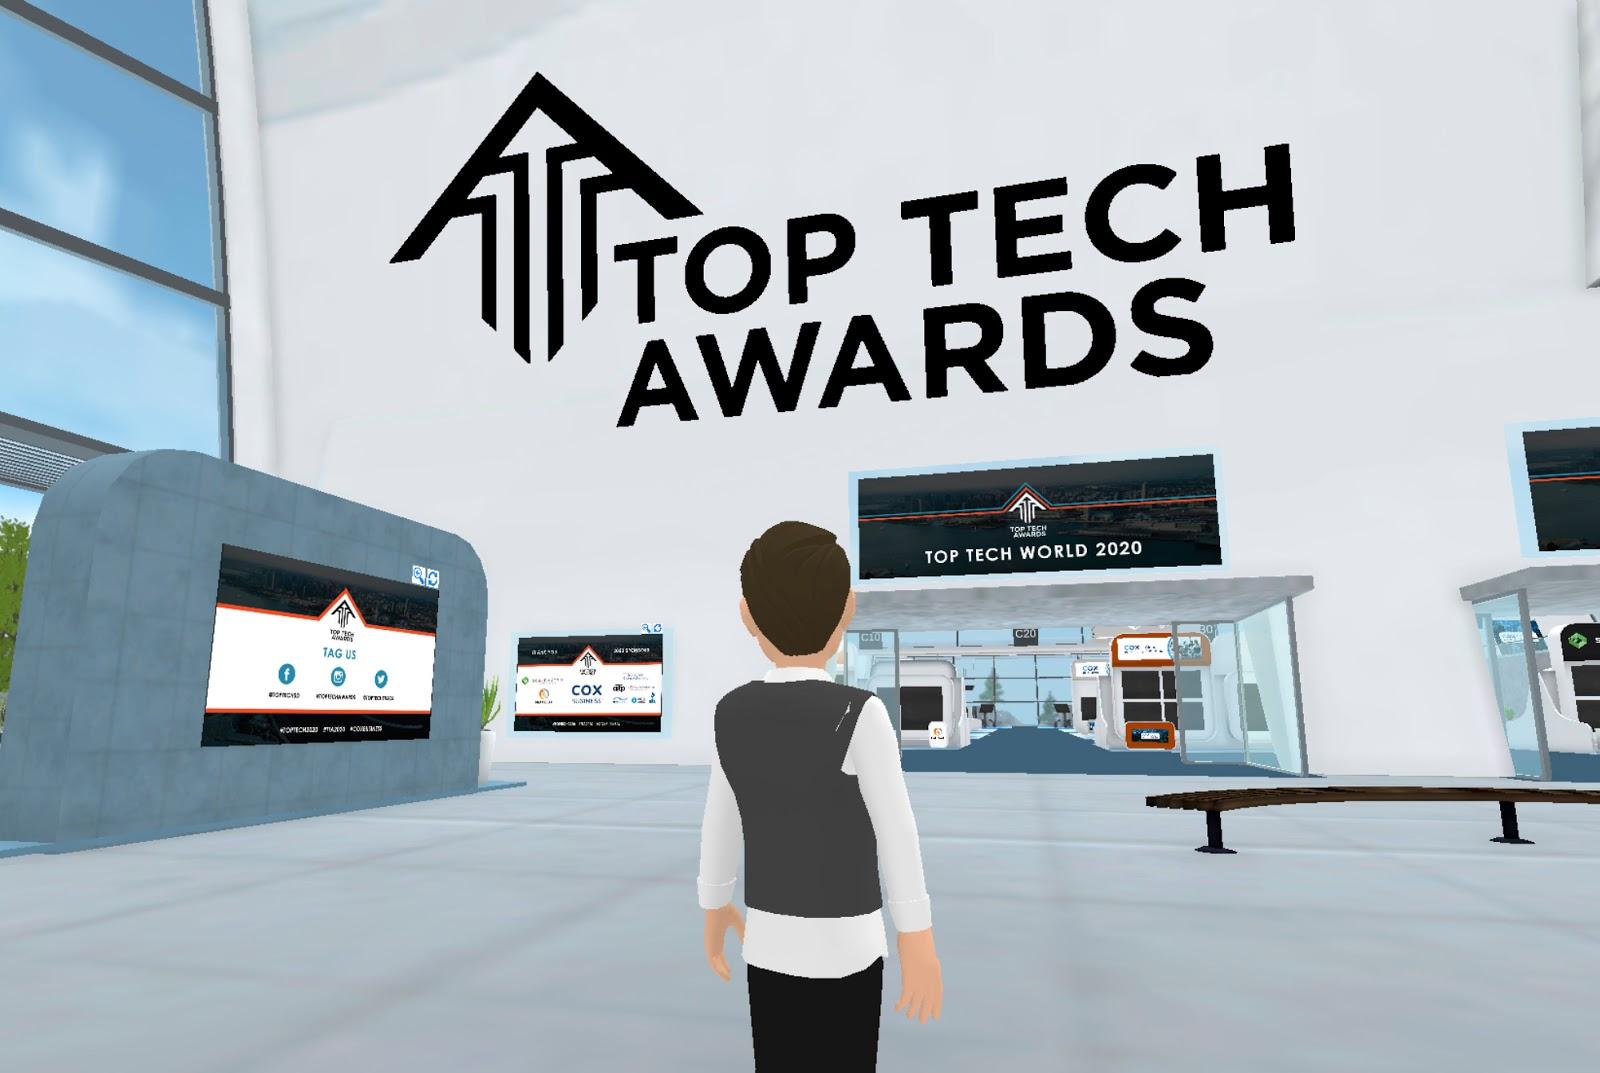 Top Tech Awards Goes Virtual to Honor California Innovators